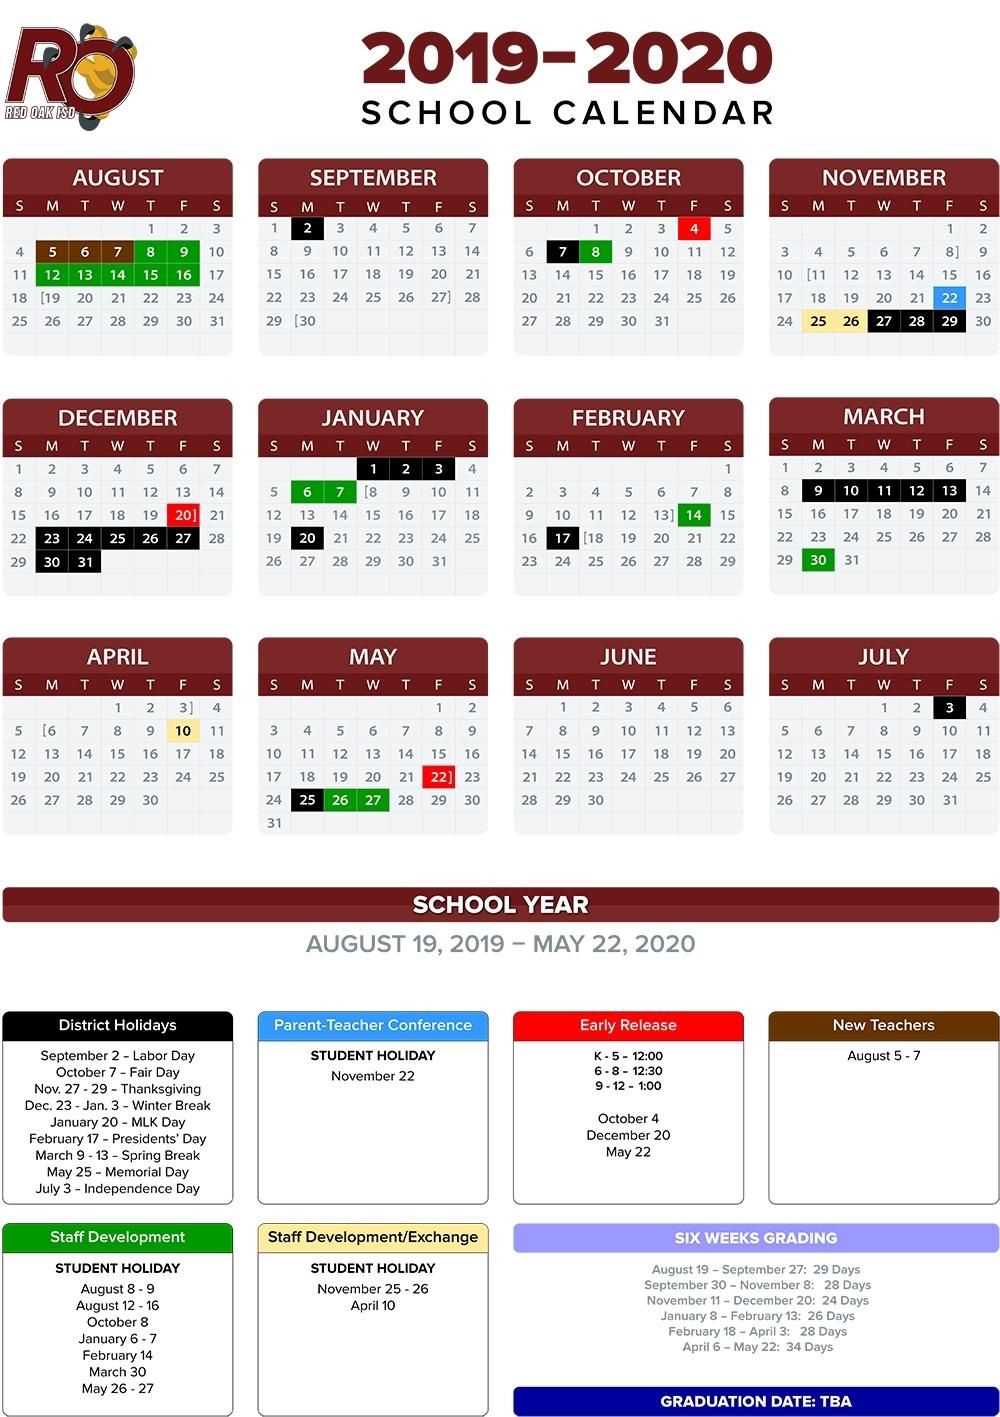 Annual School Calendar / Annual Calendar with Calendar 2019-2020 Important Dates